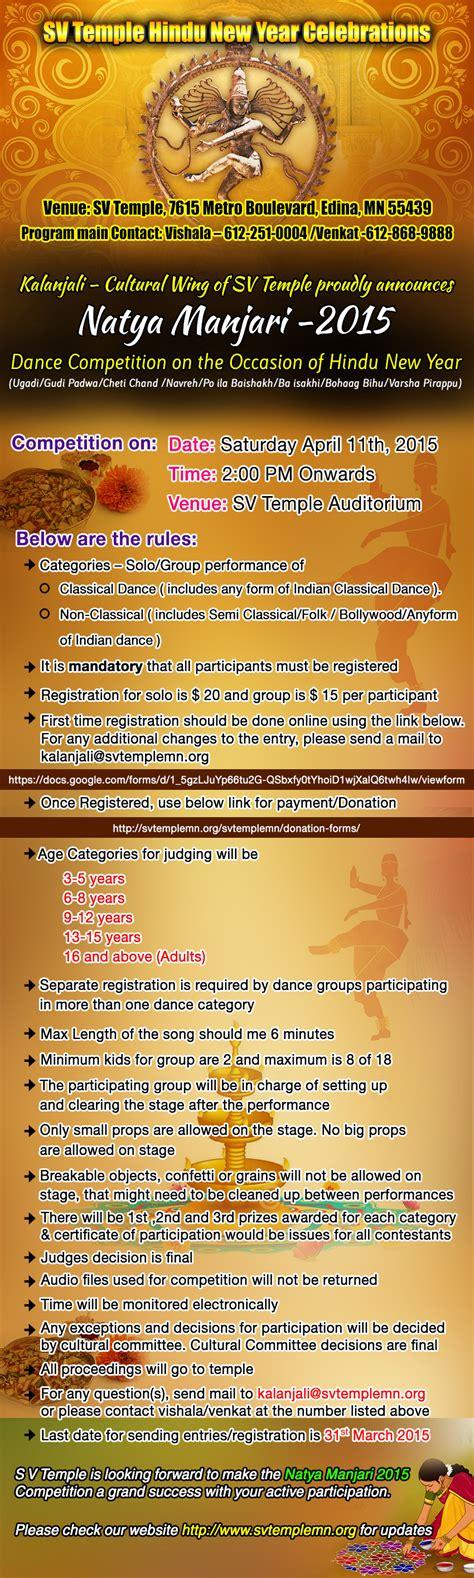 natya manjari 2015 dance competition sri venkateswara